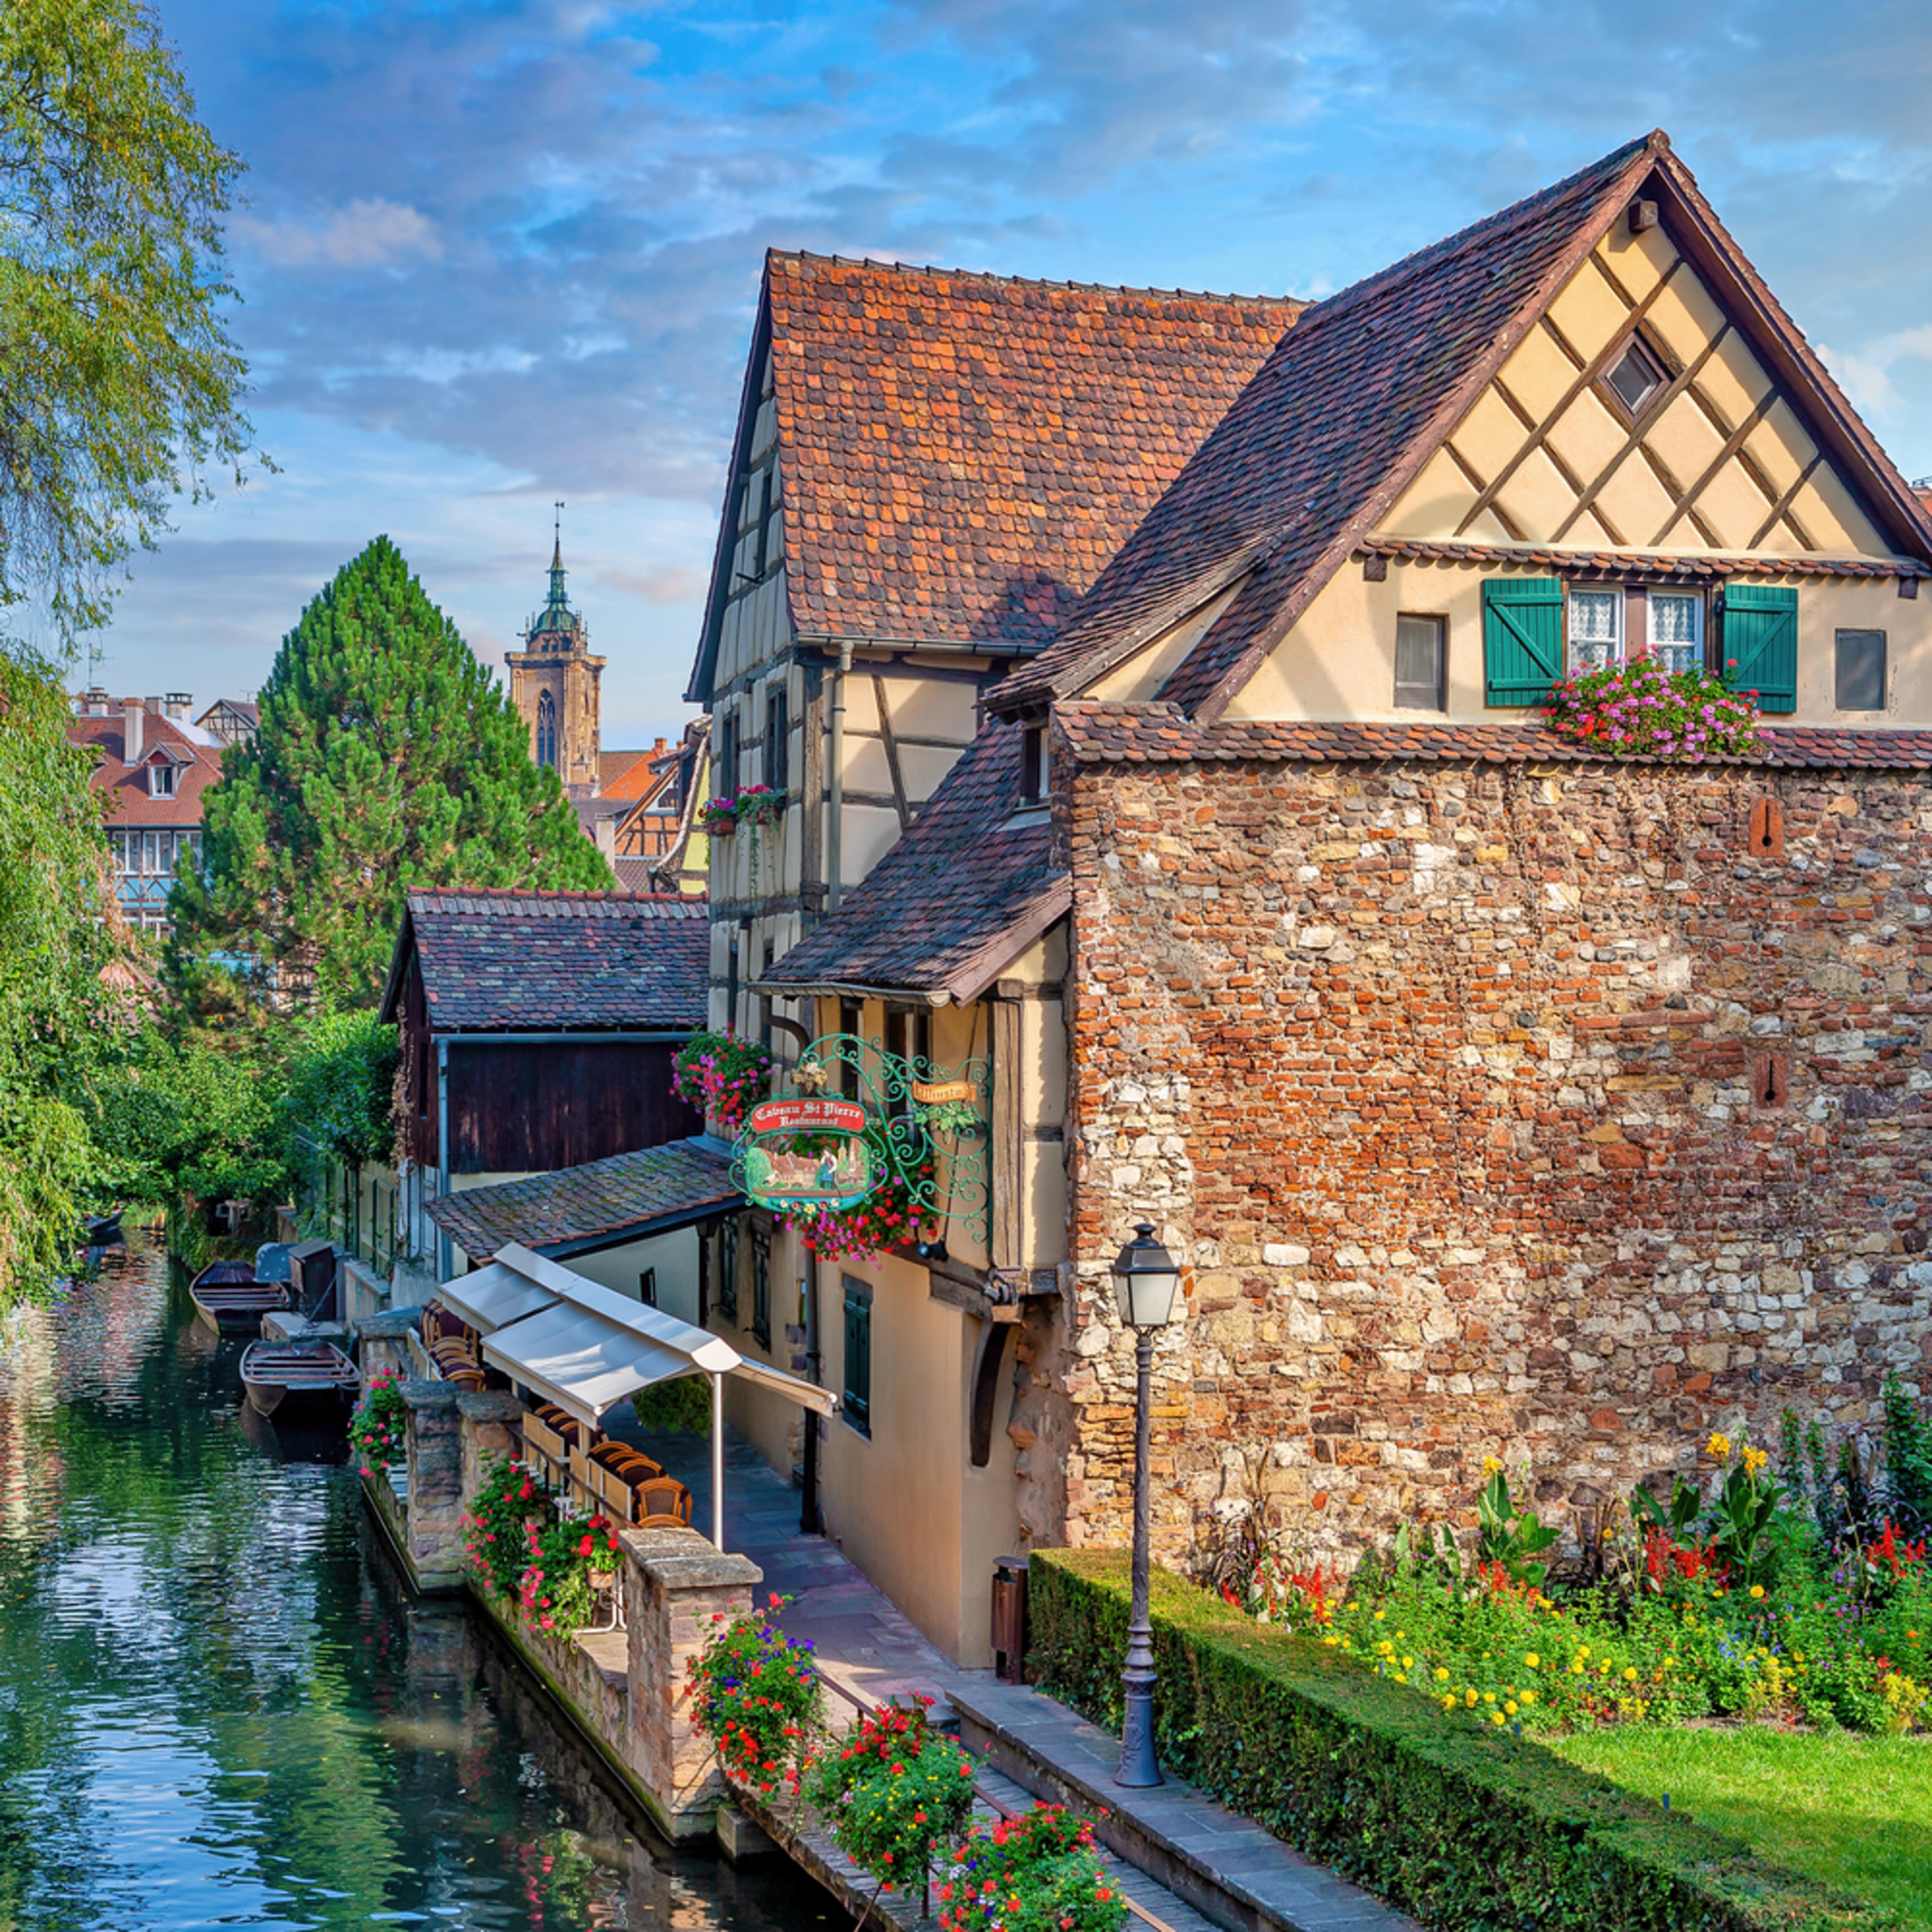 Overlooking canal in colmar france r4ocg0